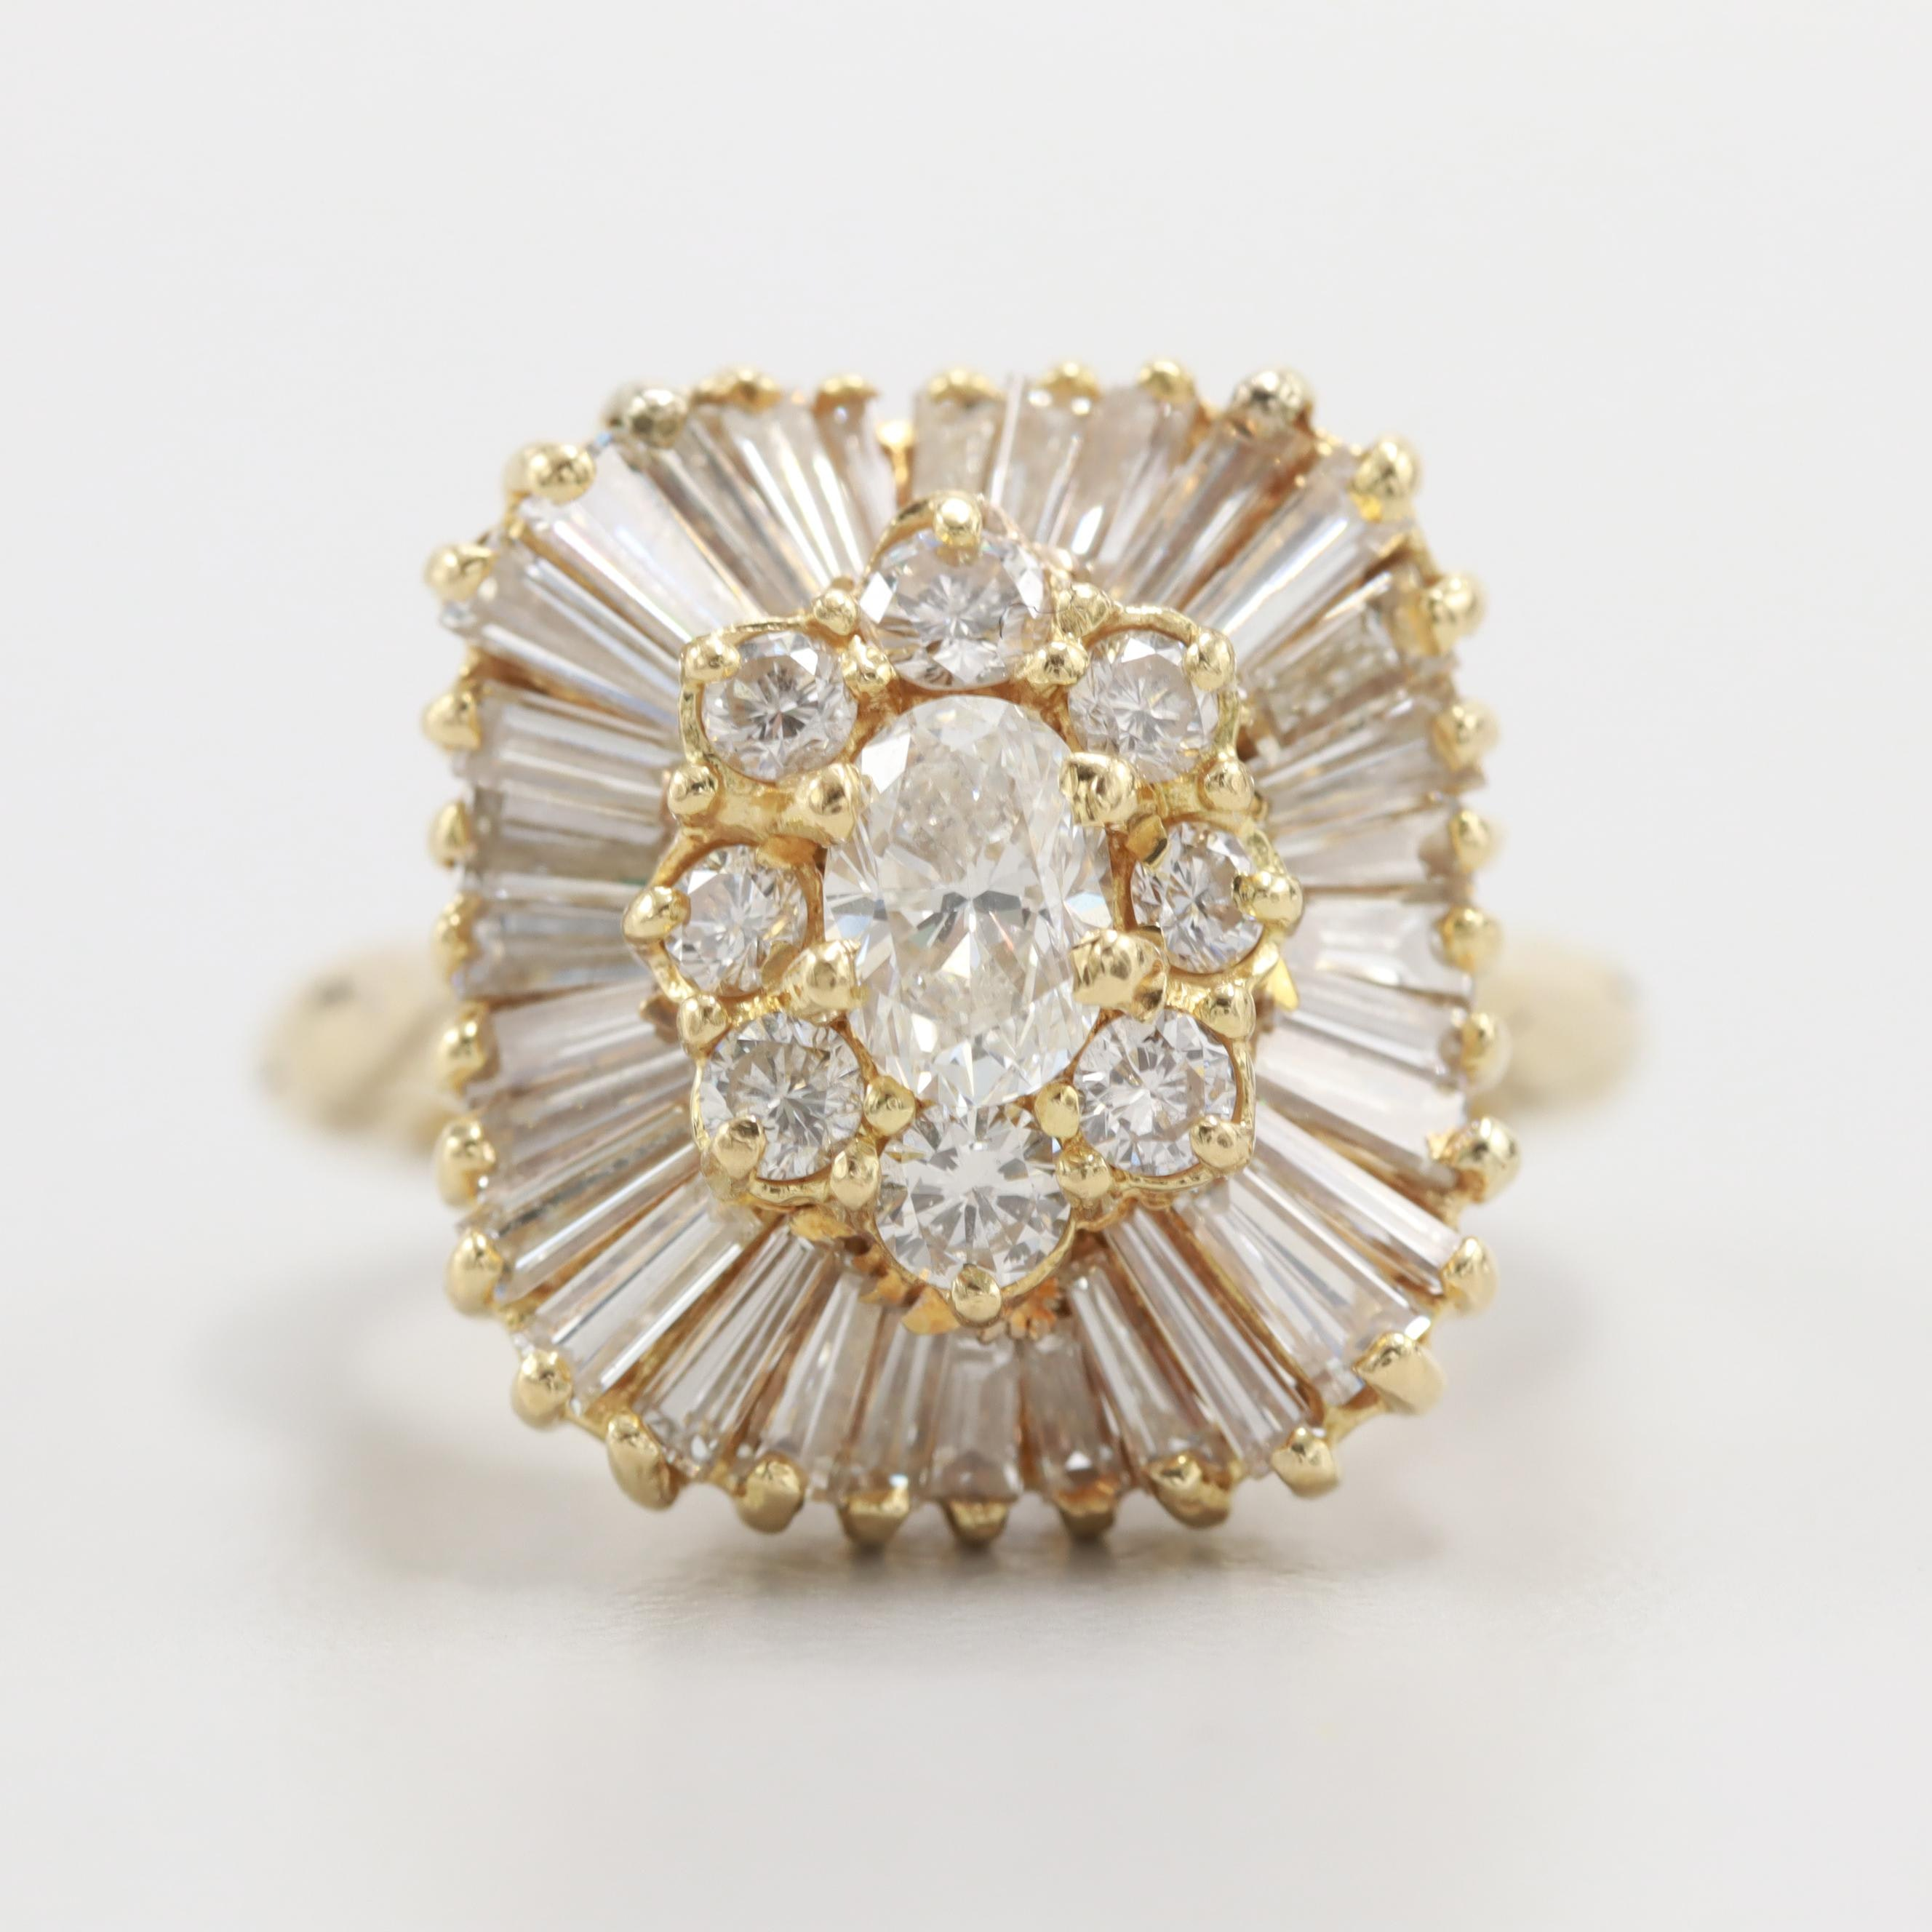 Circa 1950s 14K and 18K Yellow Gold 2.25 CTW Diamond Ballerina Ring